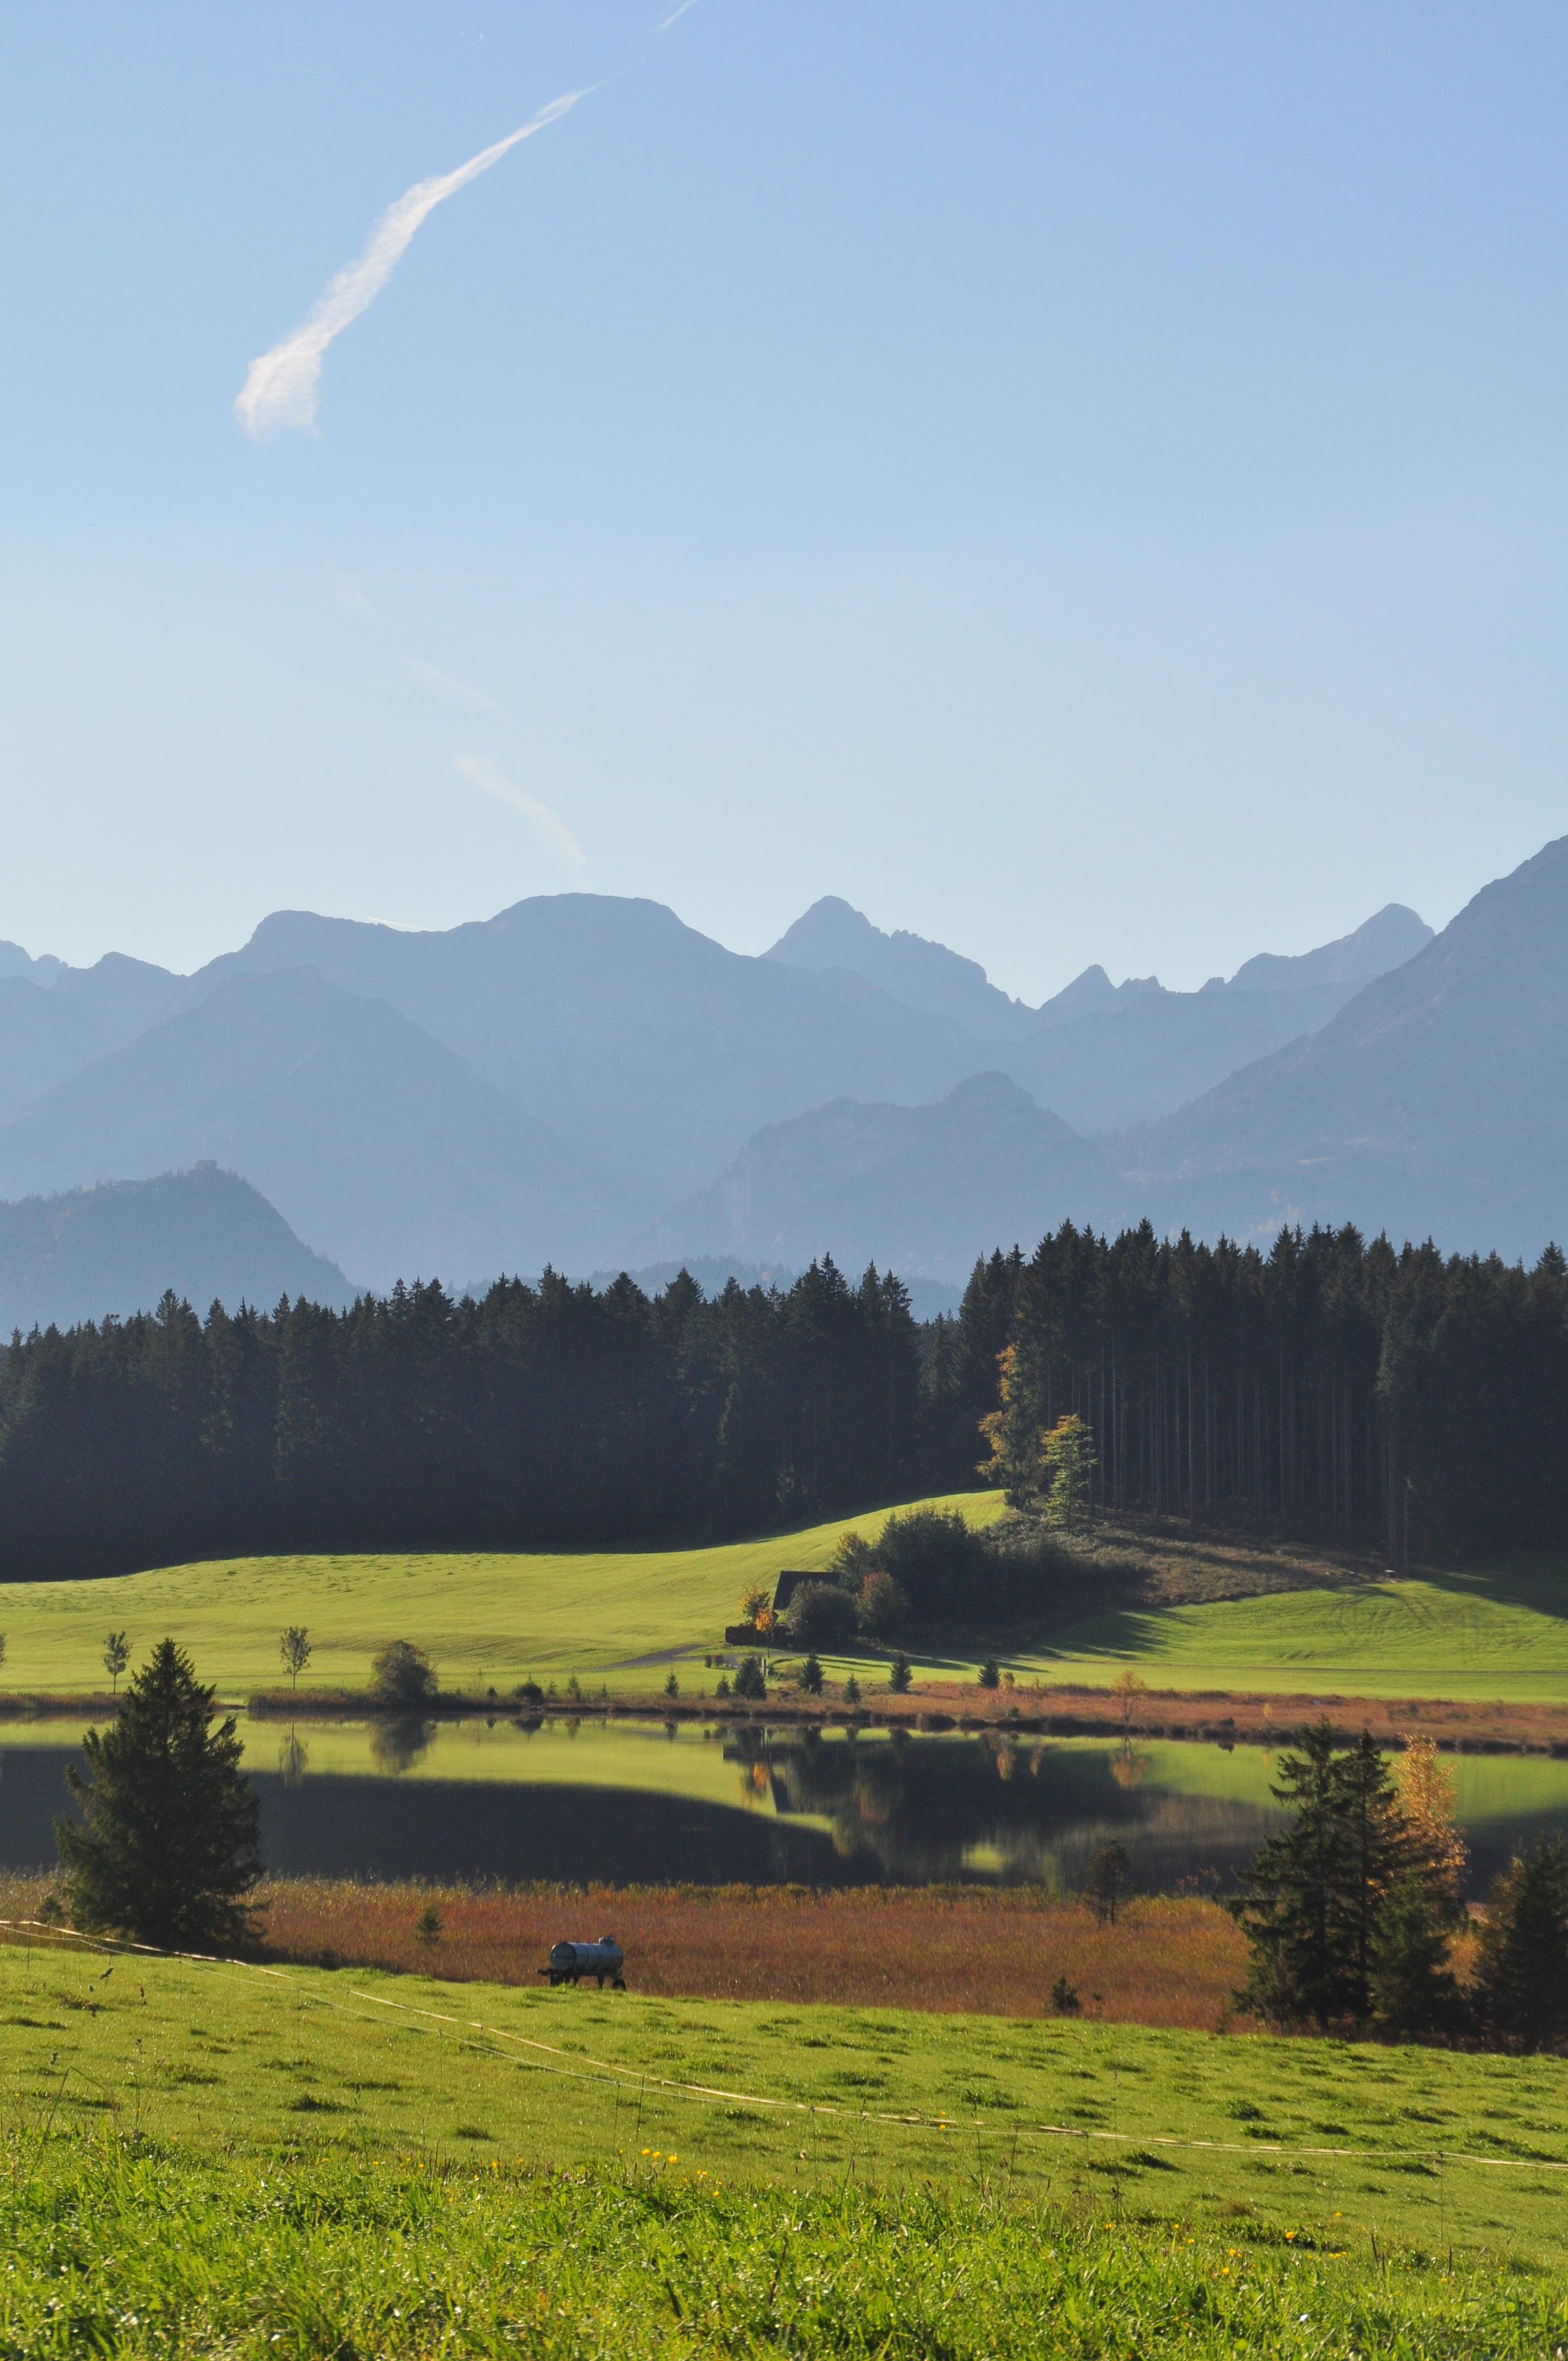 Hof Alpenseeblick weite Bergsicht im Herbst